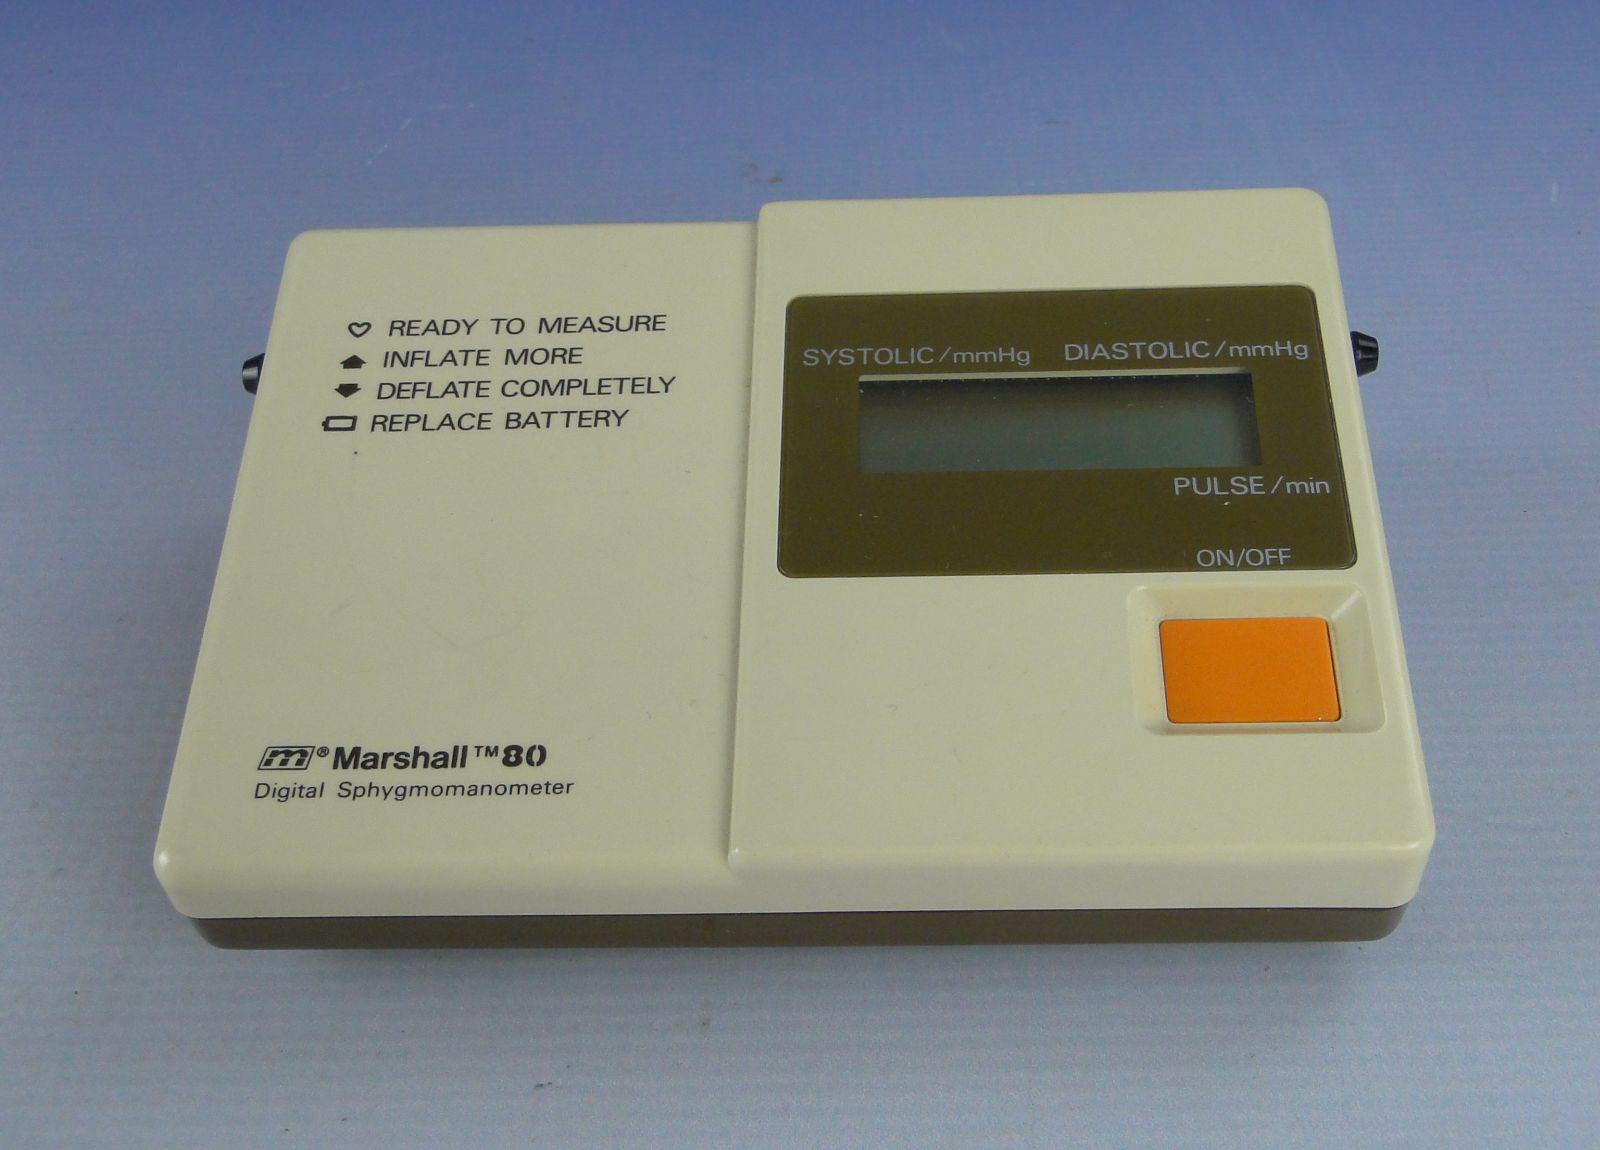 DSC09838.JPG (1600�1150)